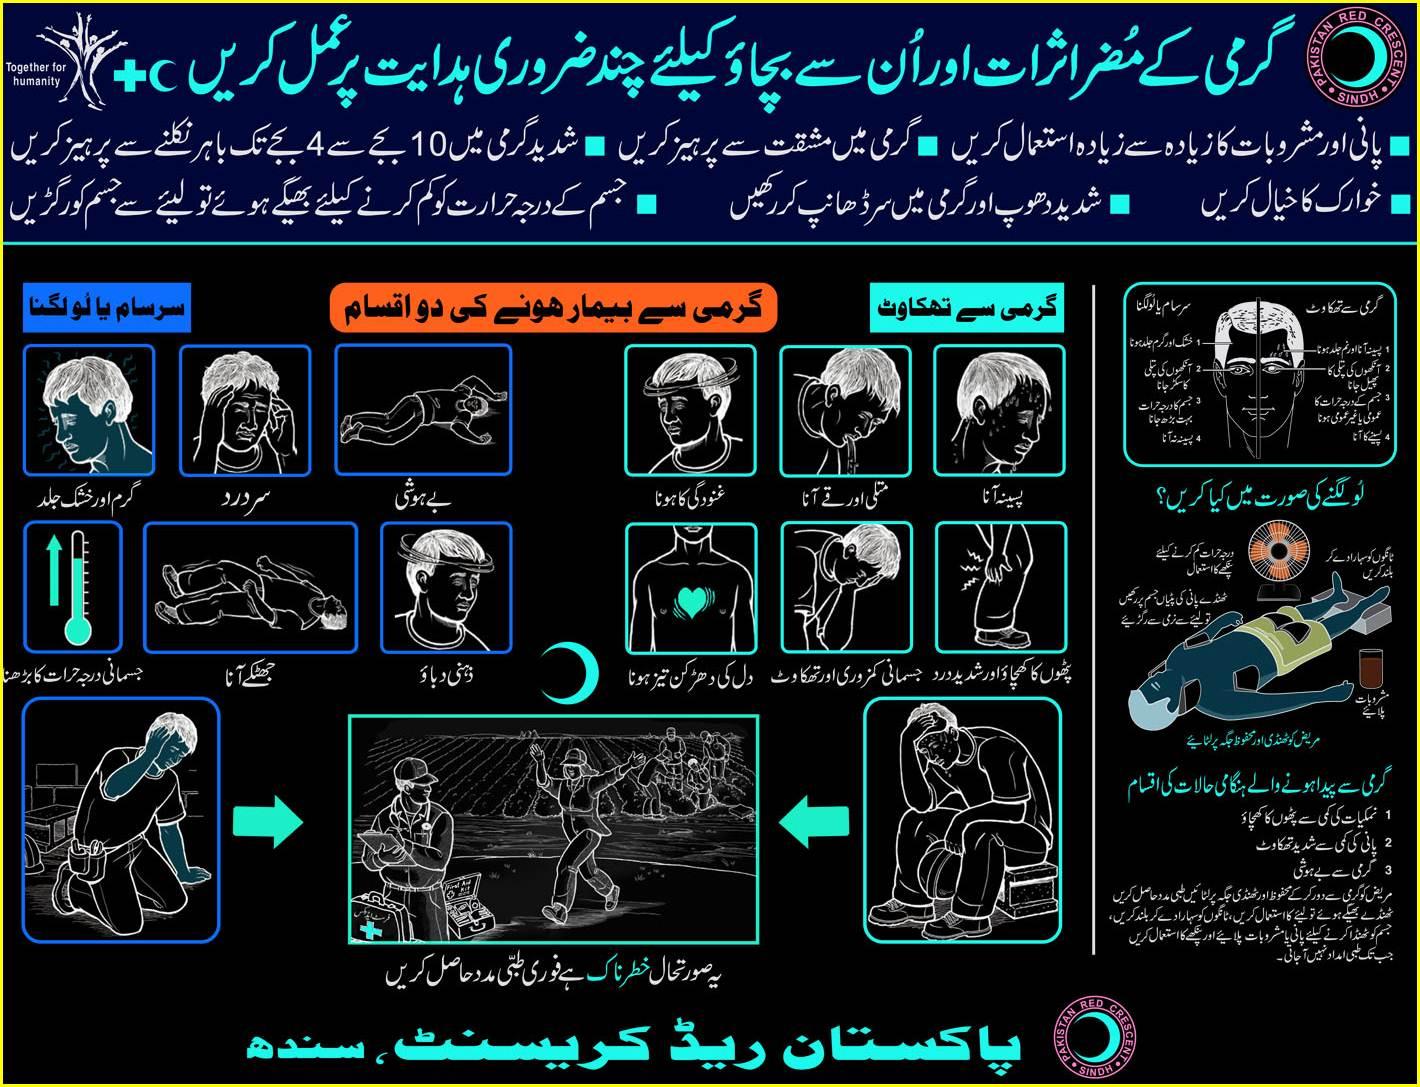 Heat Stroke Symptoms, Prevention, First Aid & Treatment in Urdu & English